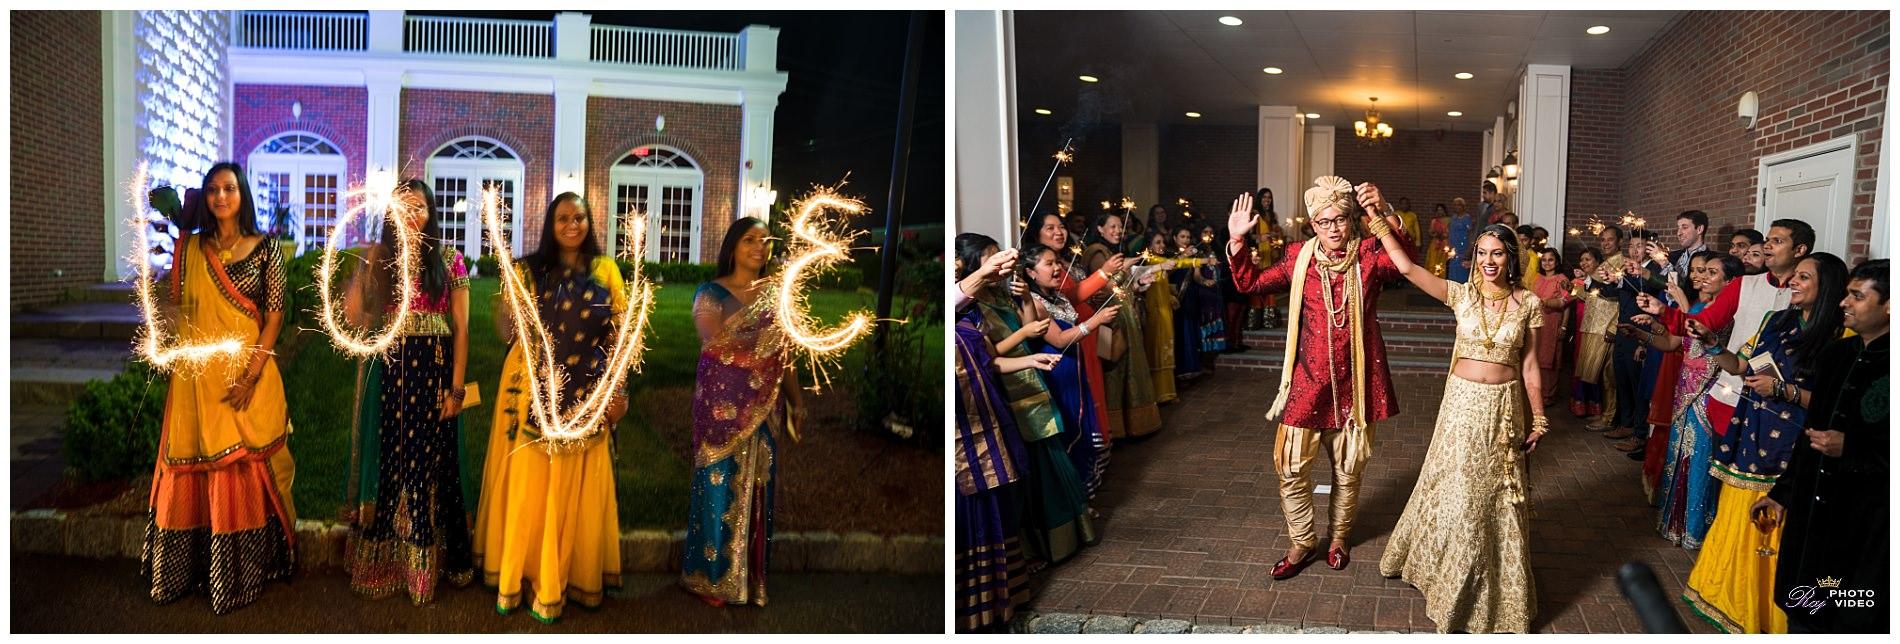 Aashirwad-Palace-Randolph-NJ-Hindu-Wedding-Ceremony-Khusbu-Jeff-26.jpg